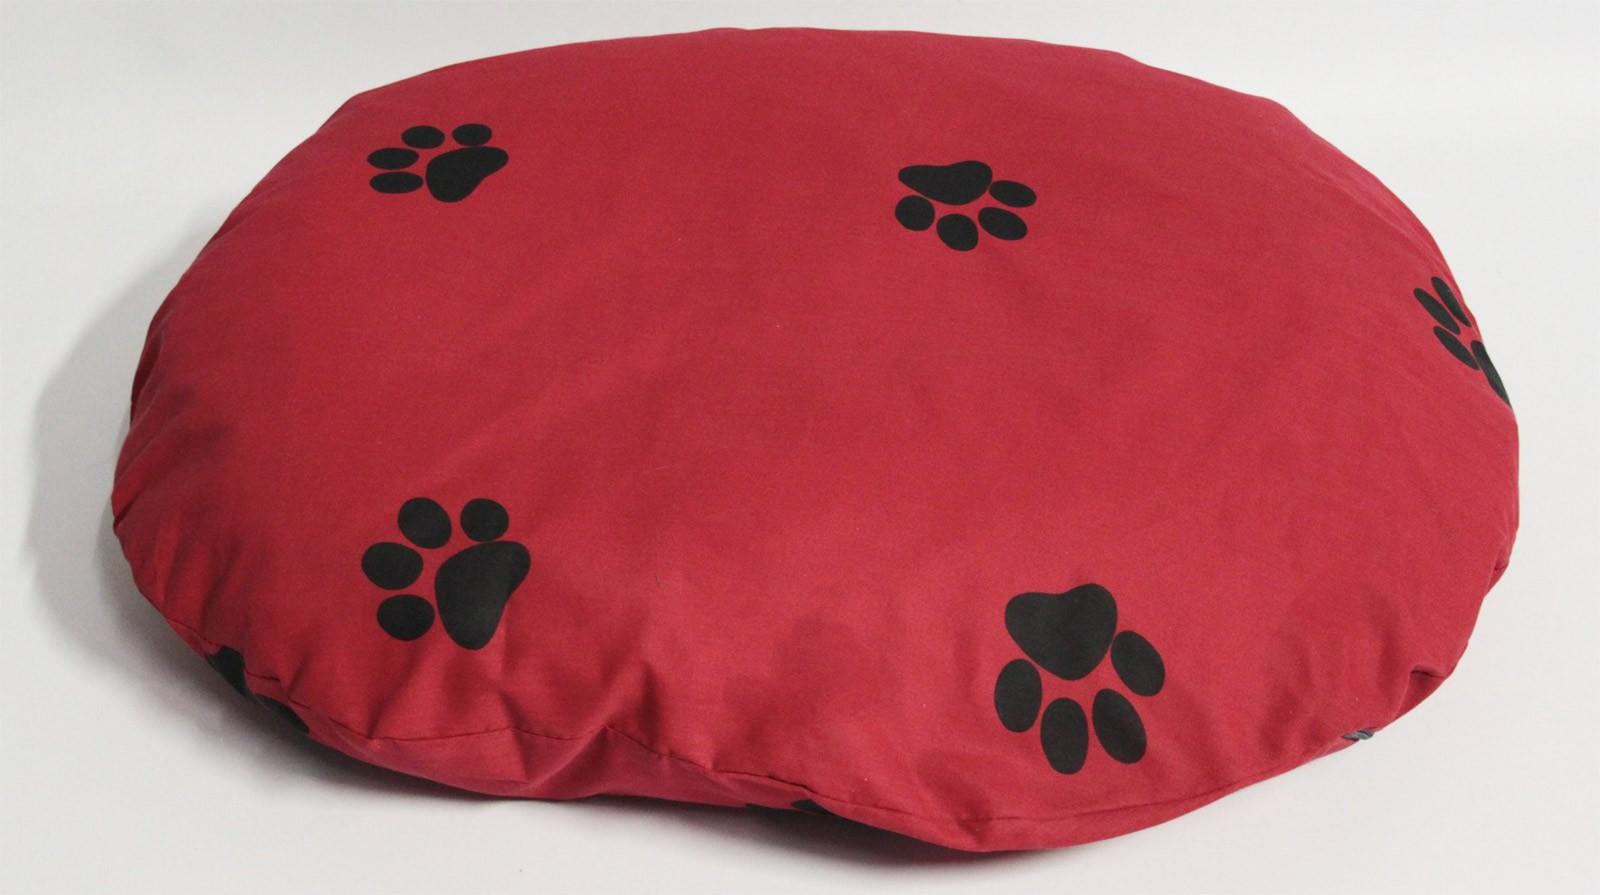 Hundebett / Hundekissen Beo 75x60x10cm oval M322 rot / grau Bild 1